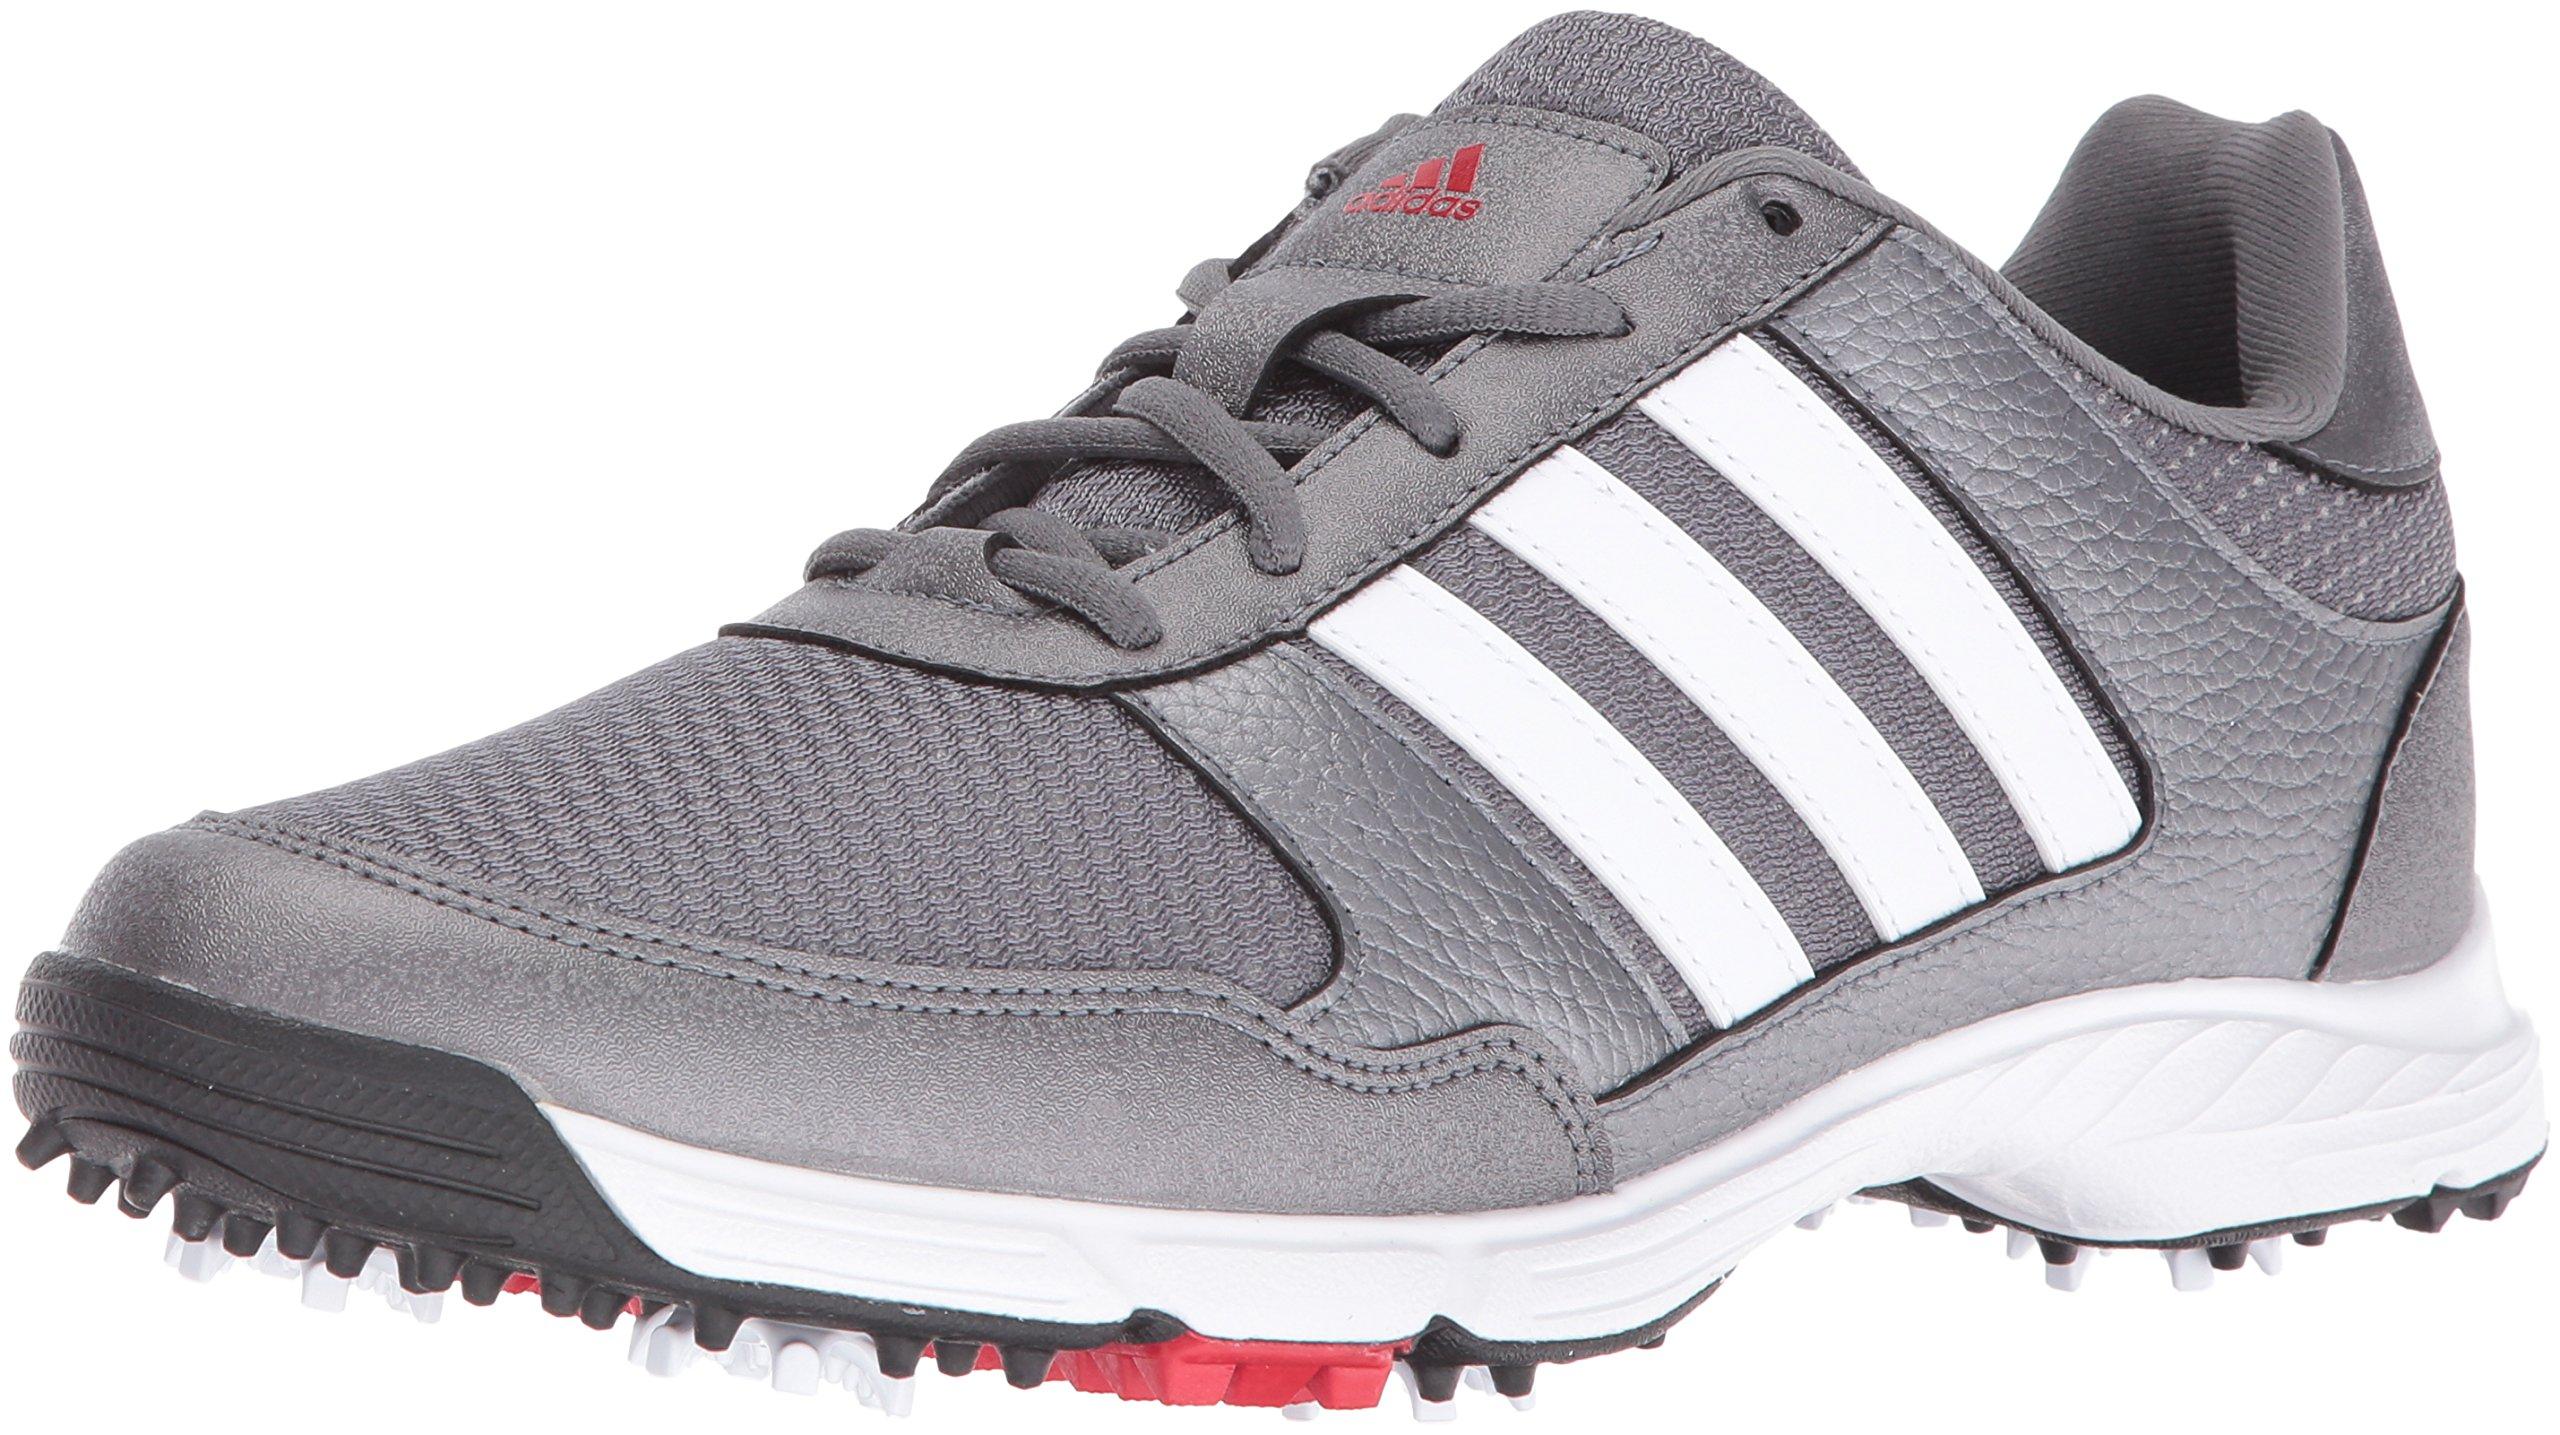 adidas Men's Tech Response Golf Shoe, Iron Metallic/White, 11 M US by adidas